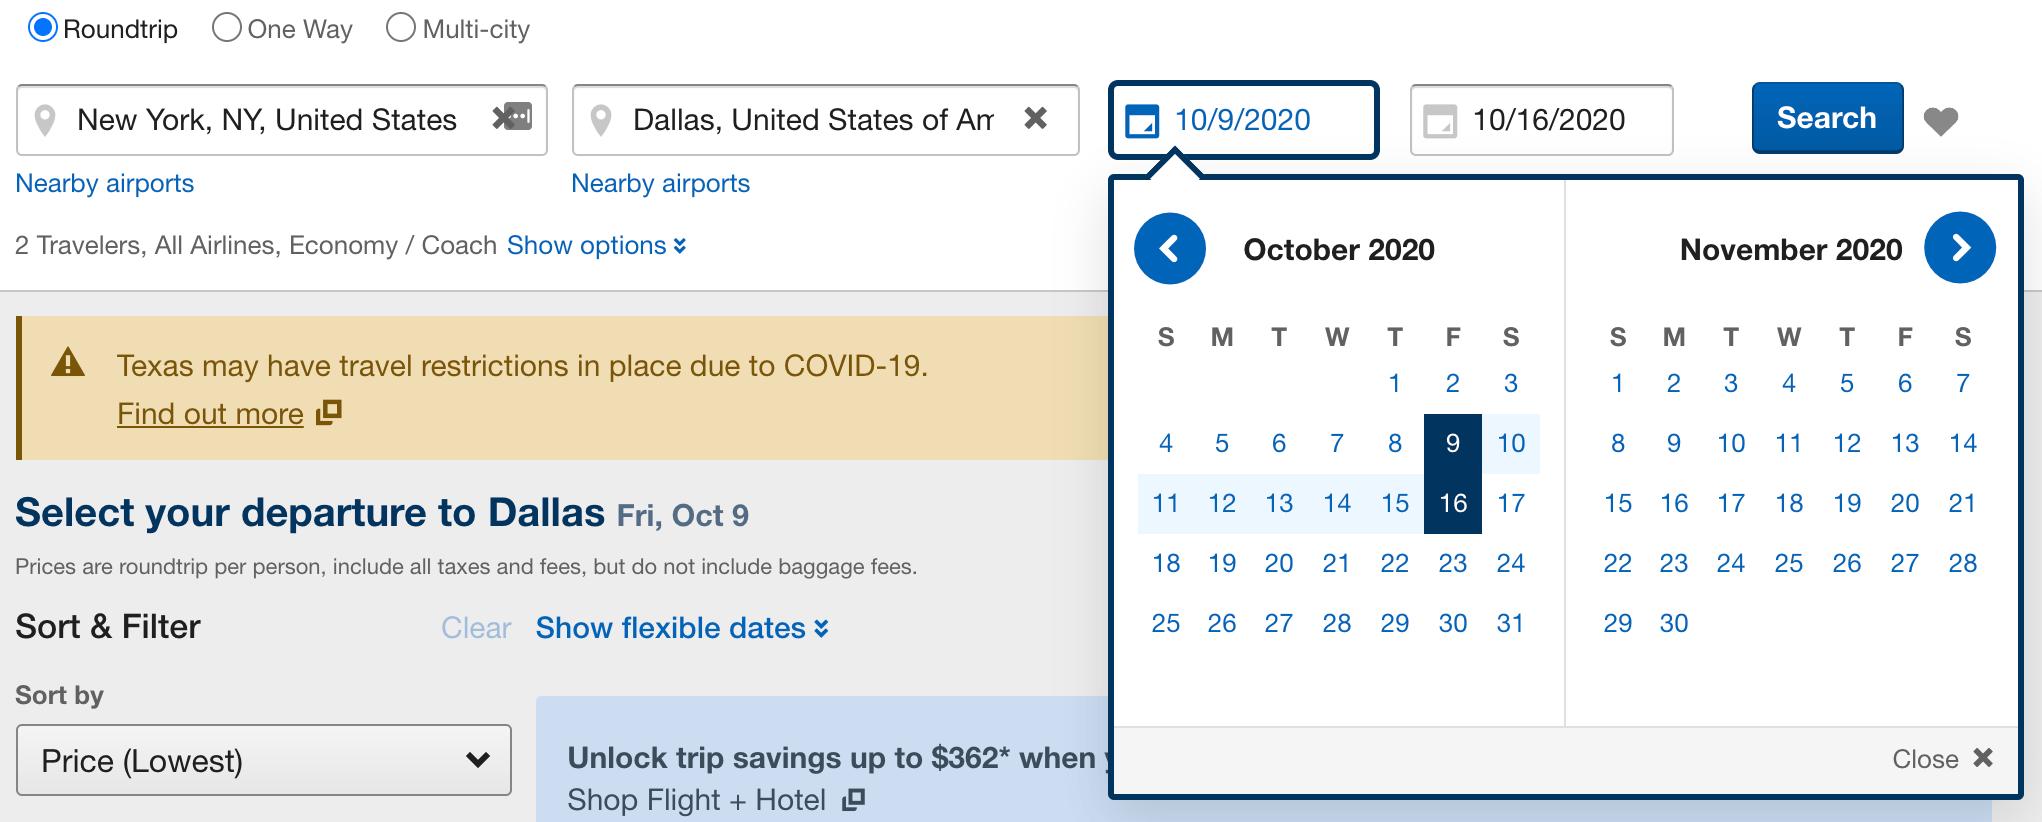 Screengrab from Expedia